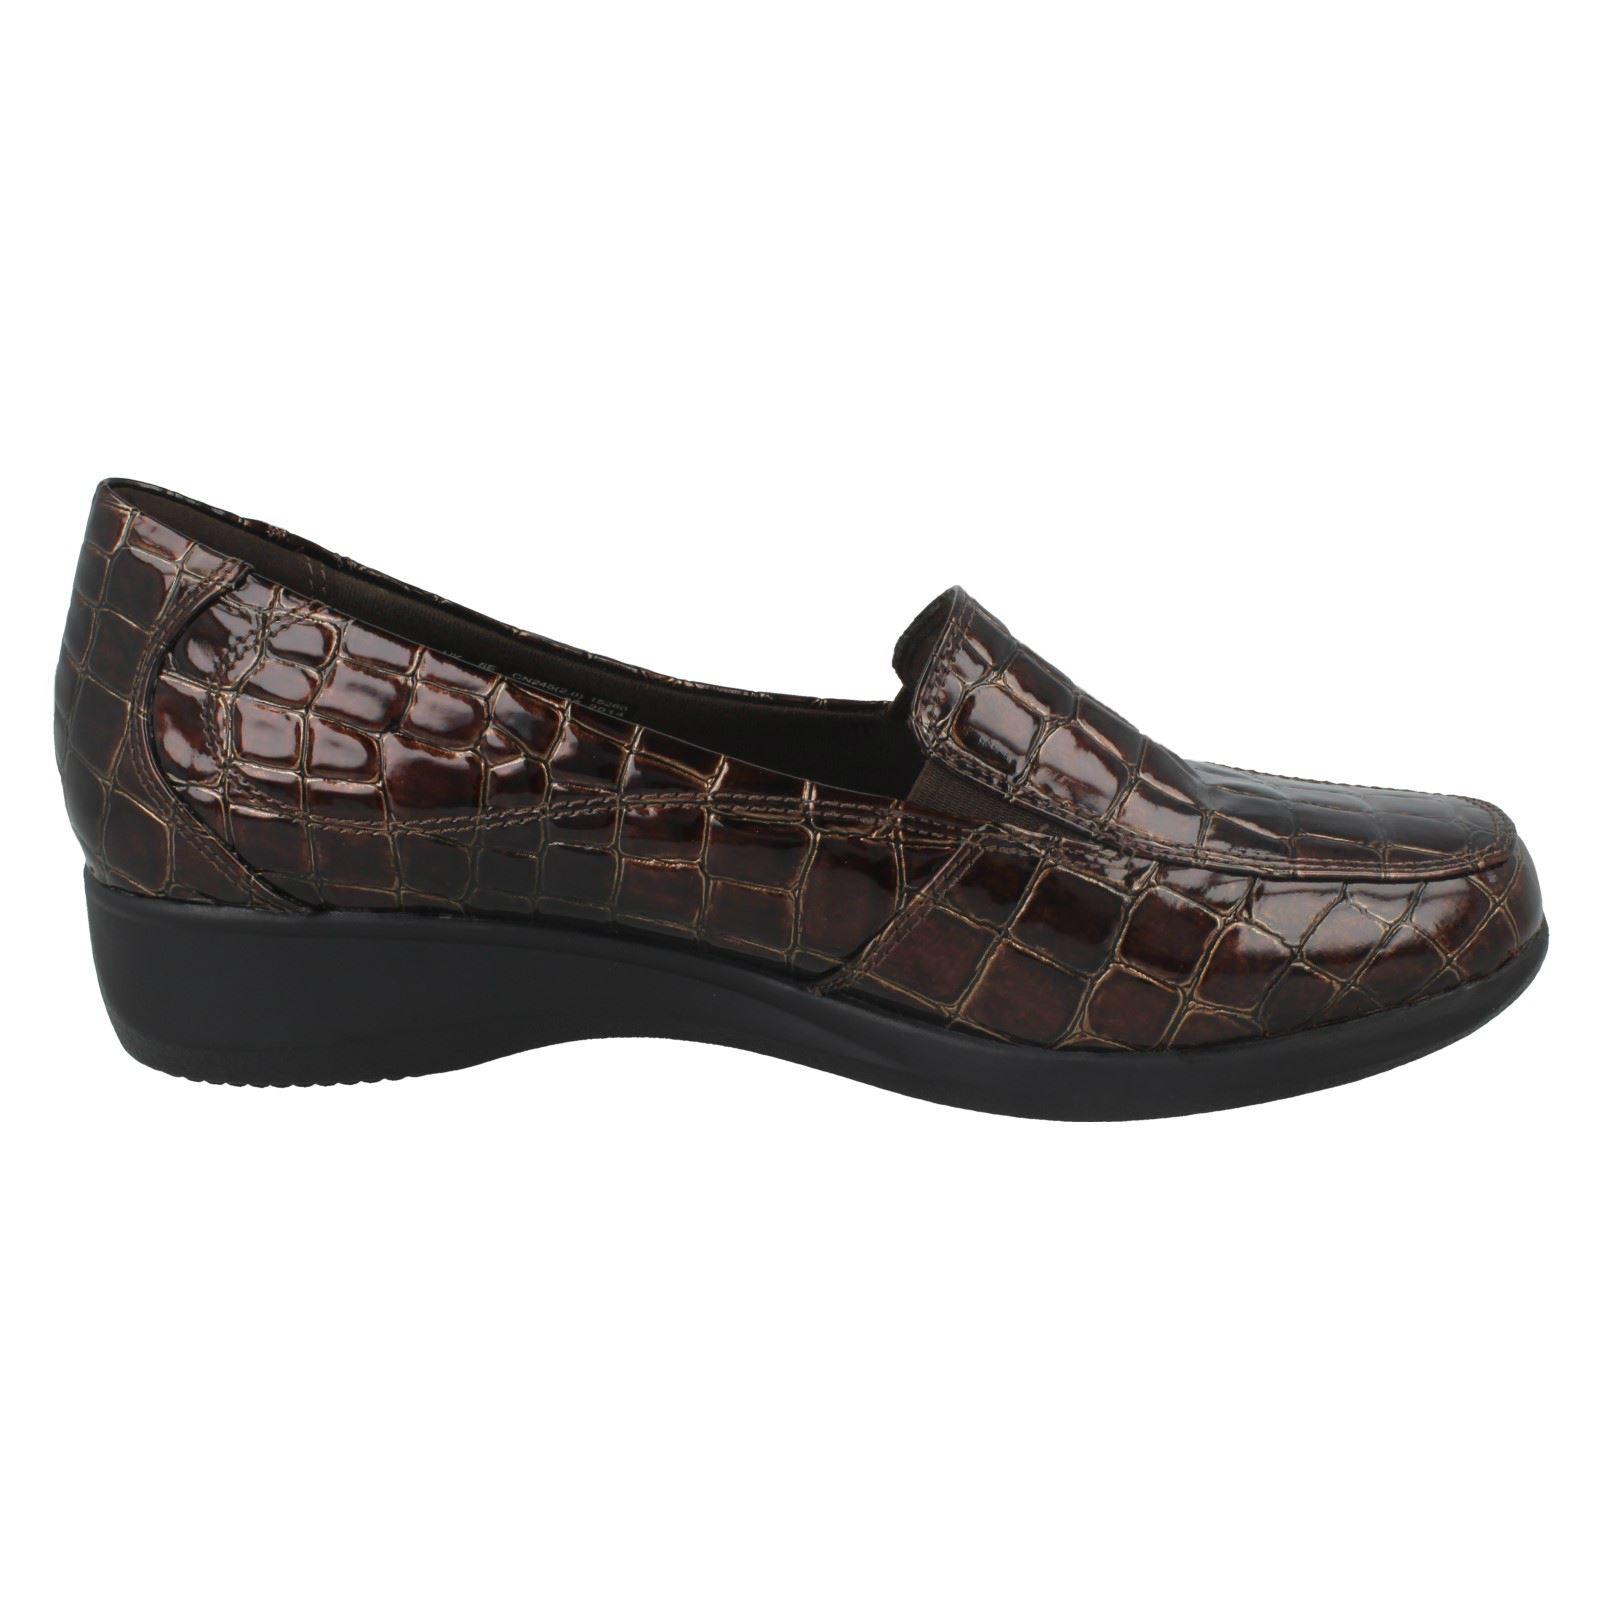 Ladies Clarks Slip On Shoes /'Gael Angora/'